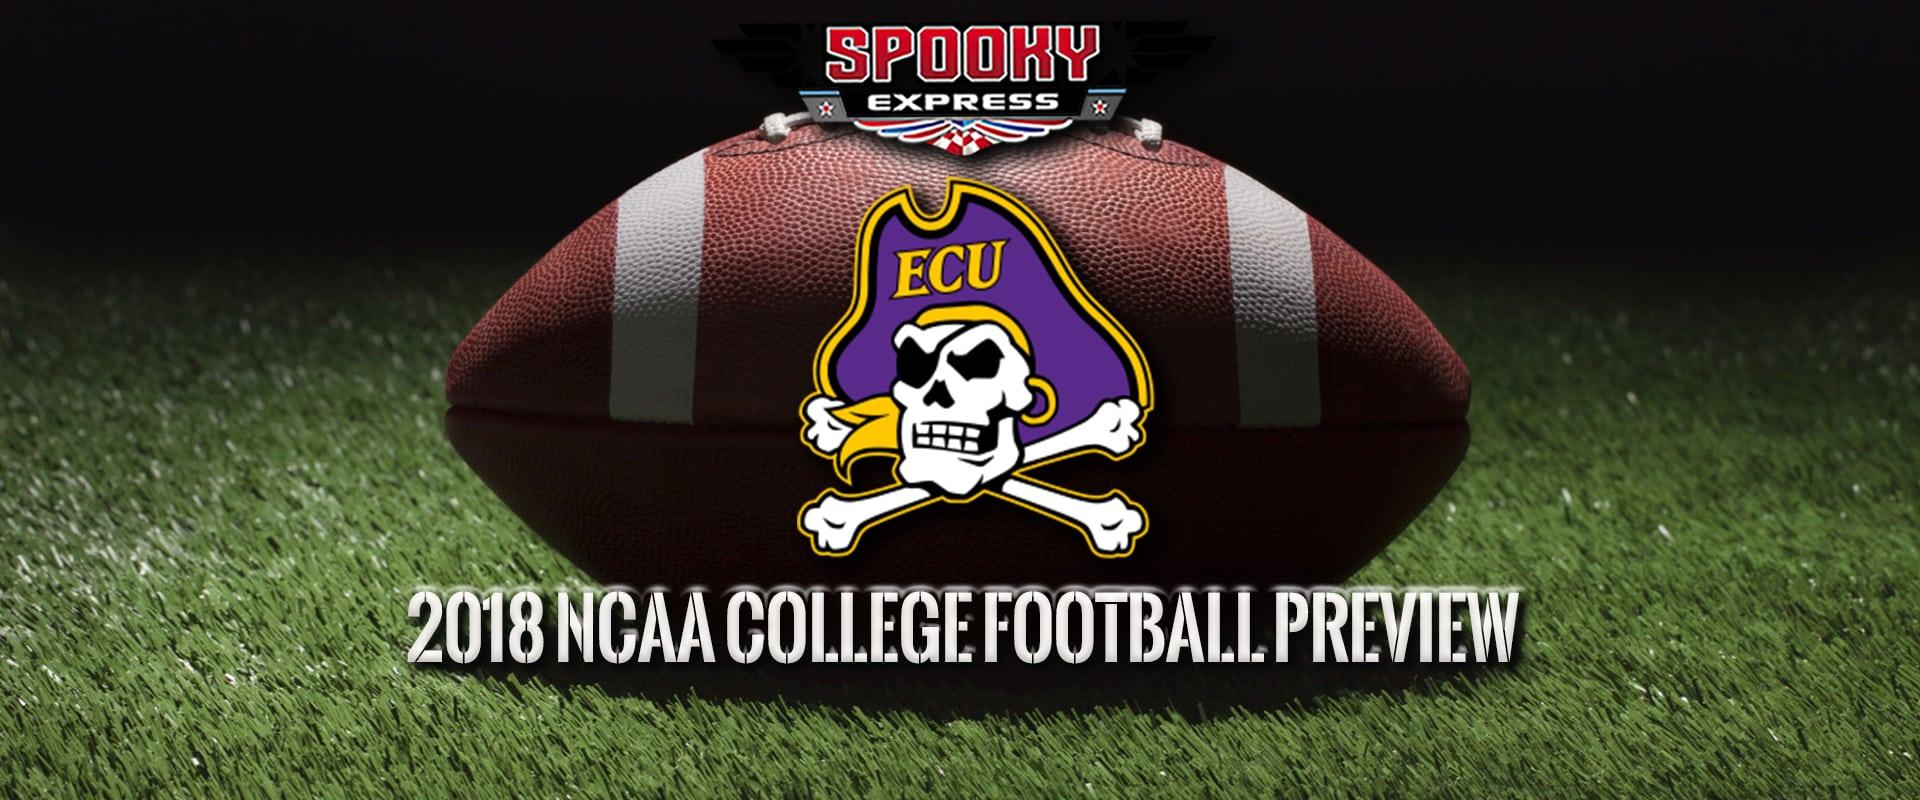 2018 East Carolina Pirates College Football Preview